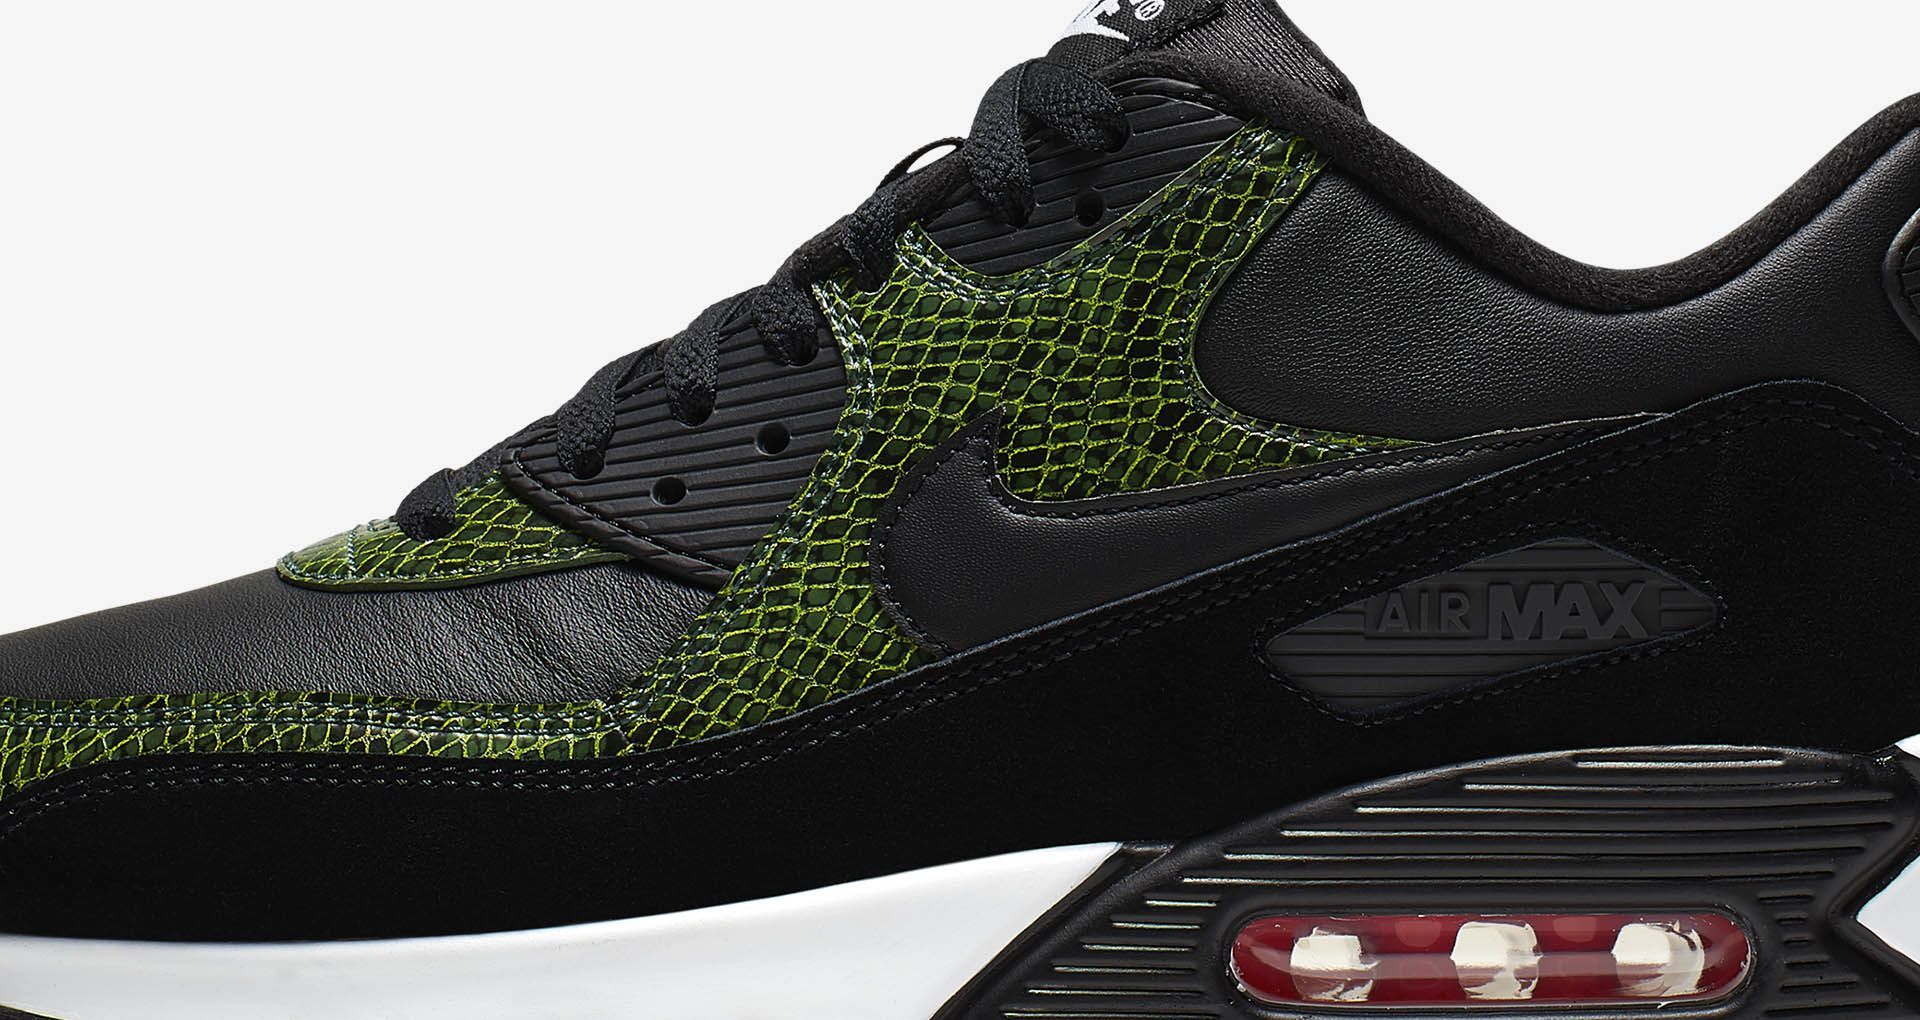 07-nike-air-max-90-green-python-cd0916-001